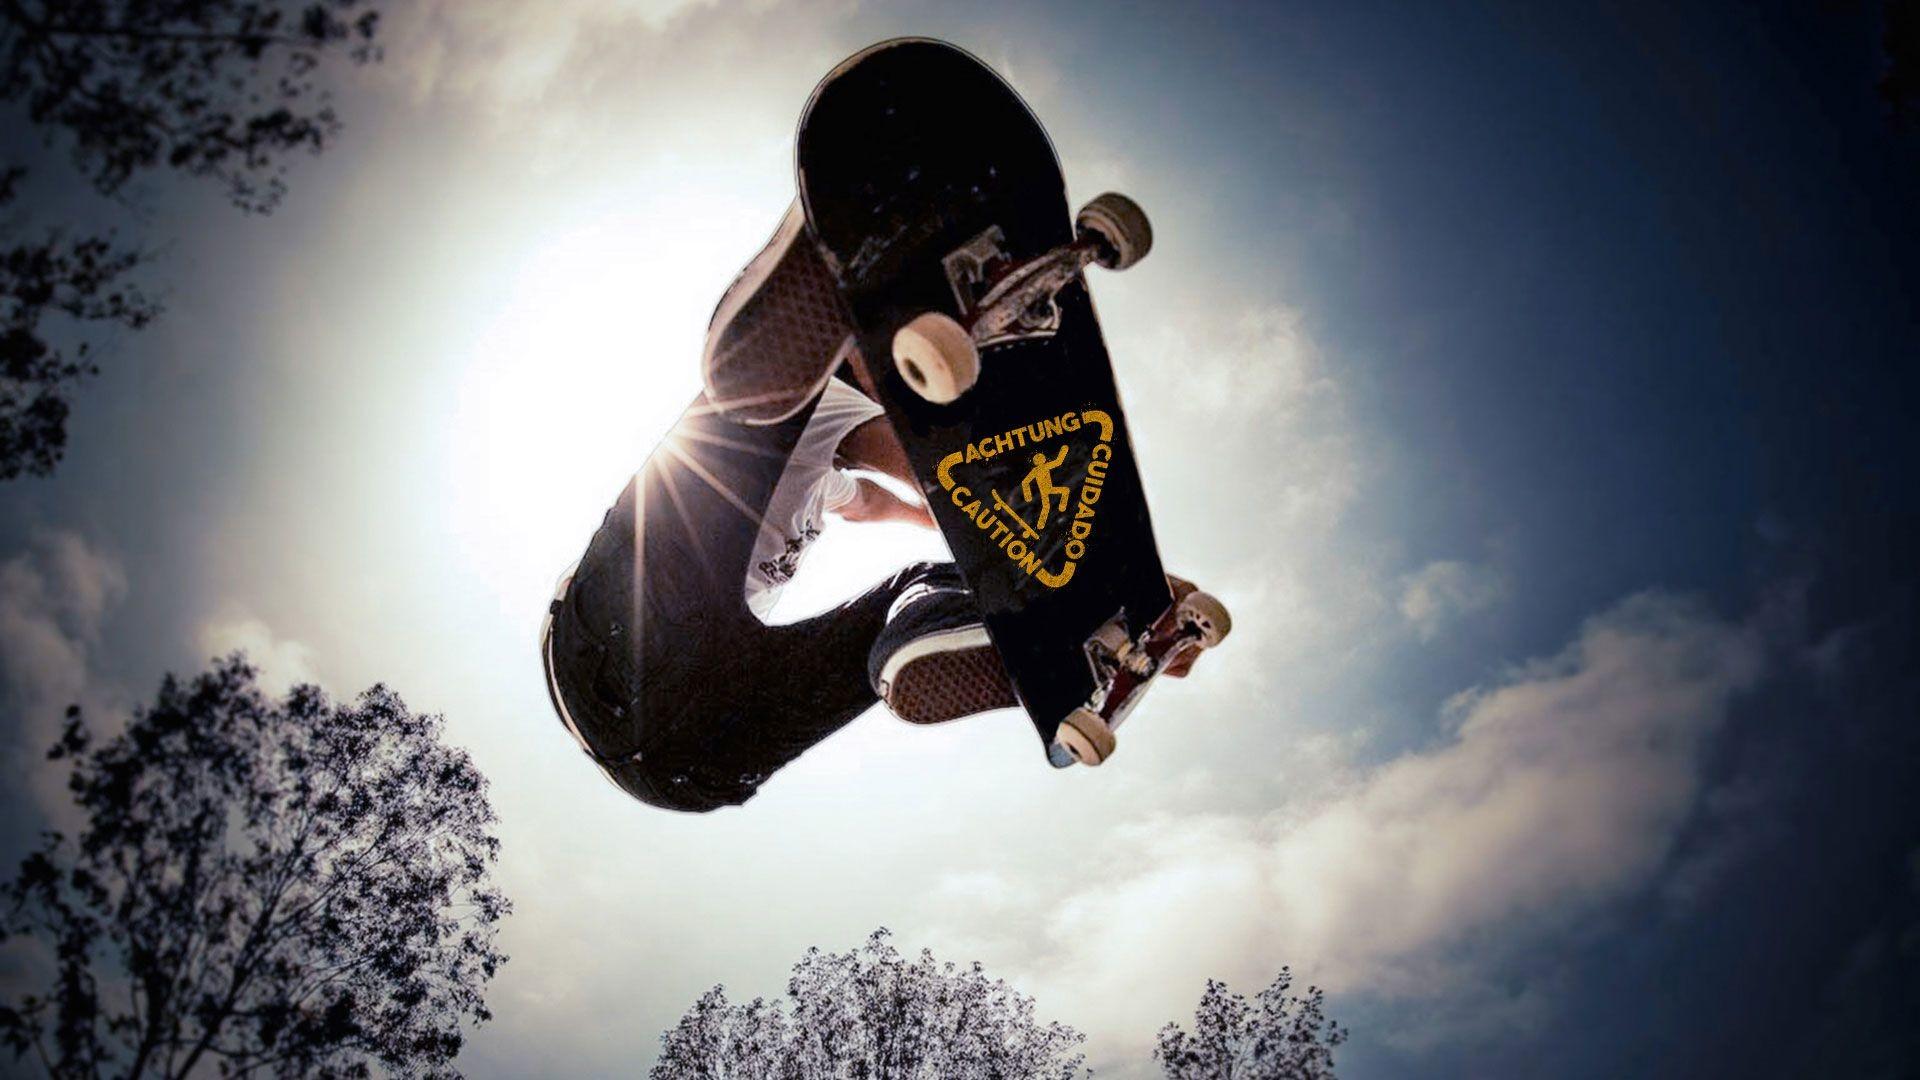 Skate Full HD Wallpaper, Picture, Image